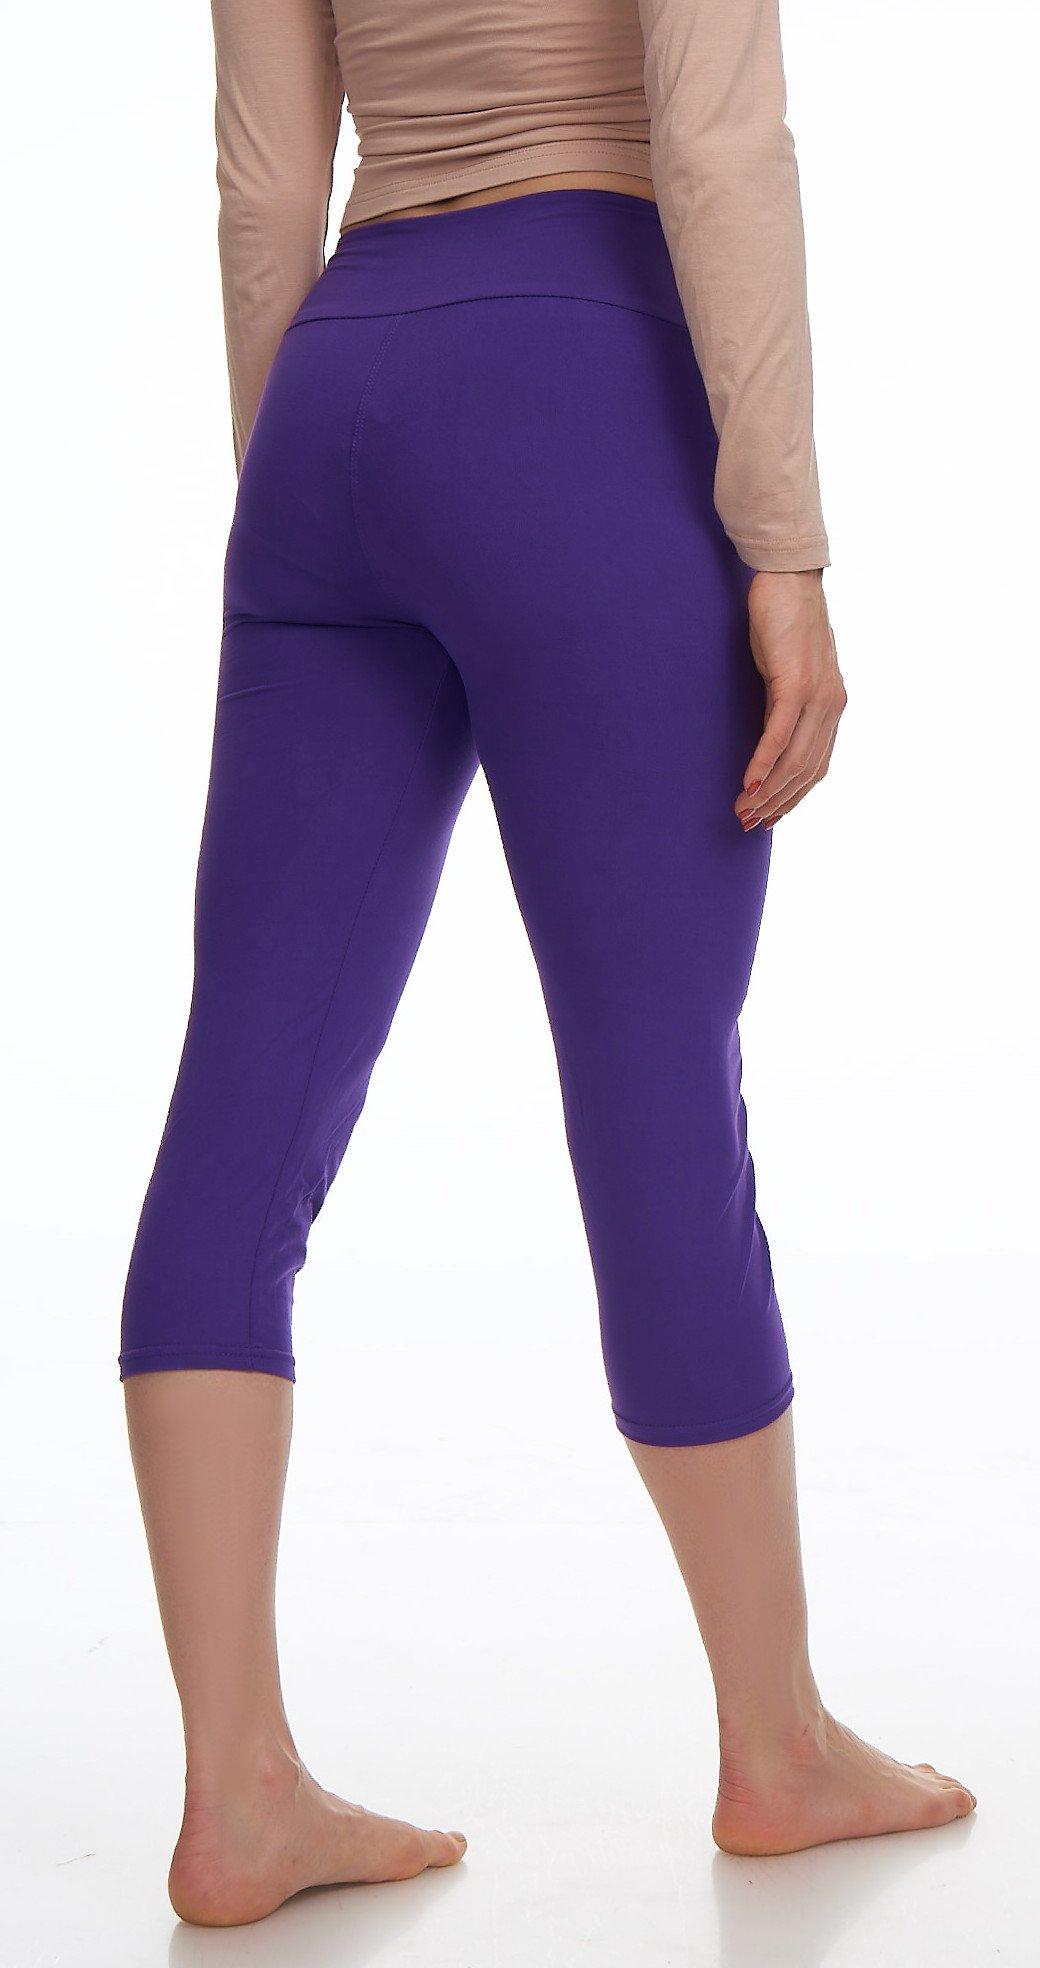 Lush Moda Extra Soft Leggings Variety of ColorsPlus Size Yoga Waist Purple, One Size fits Most (XL 3XL), Purple Yoga Waist by LMB (Image #4)